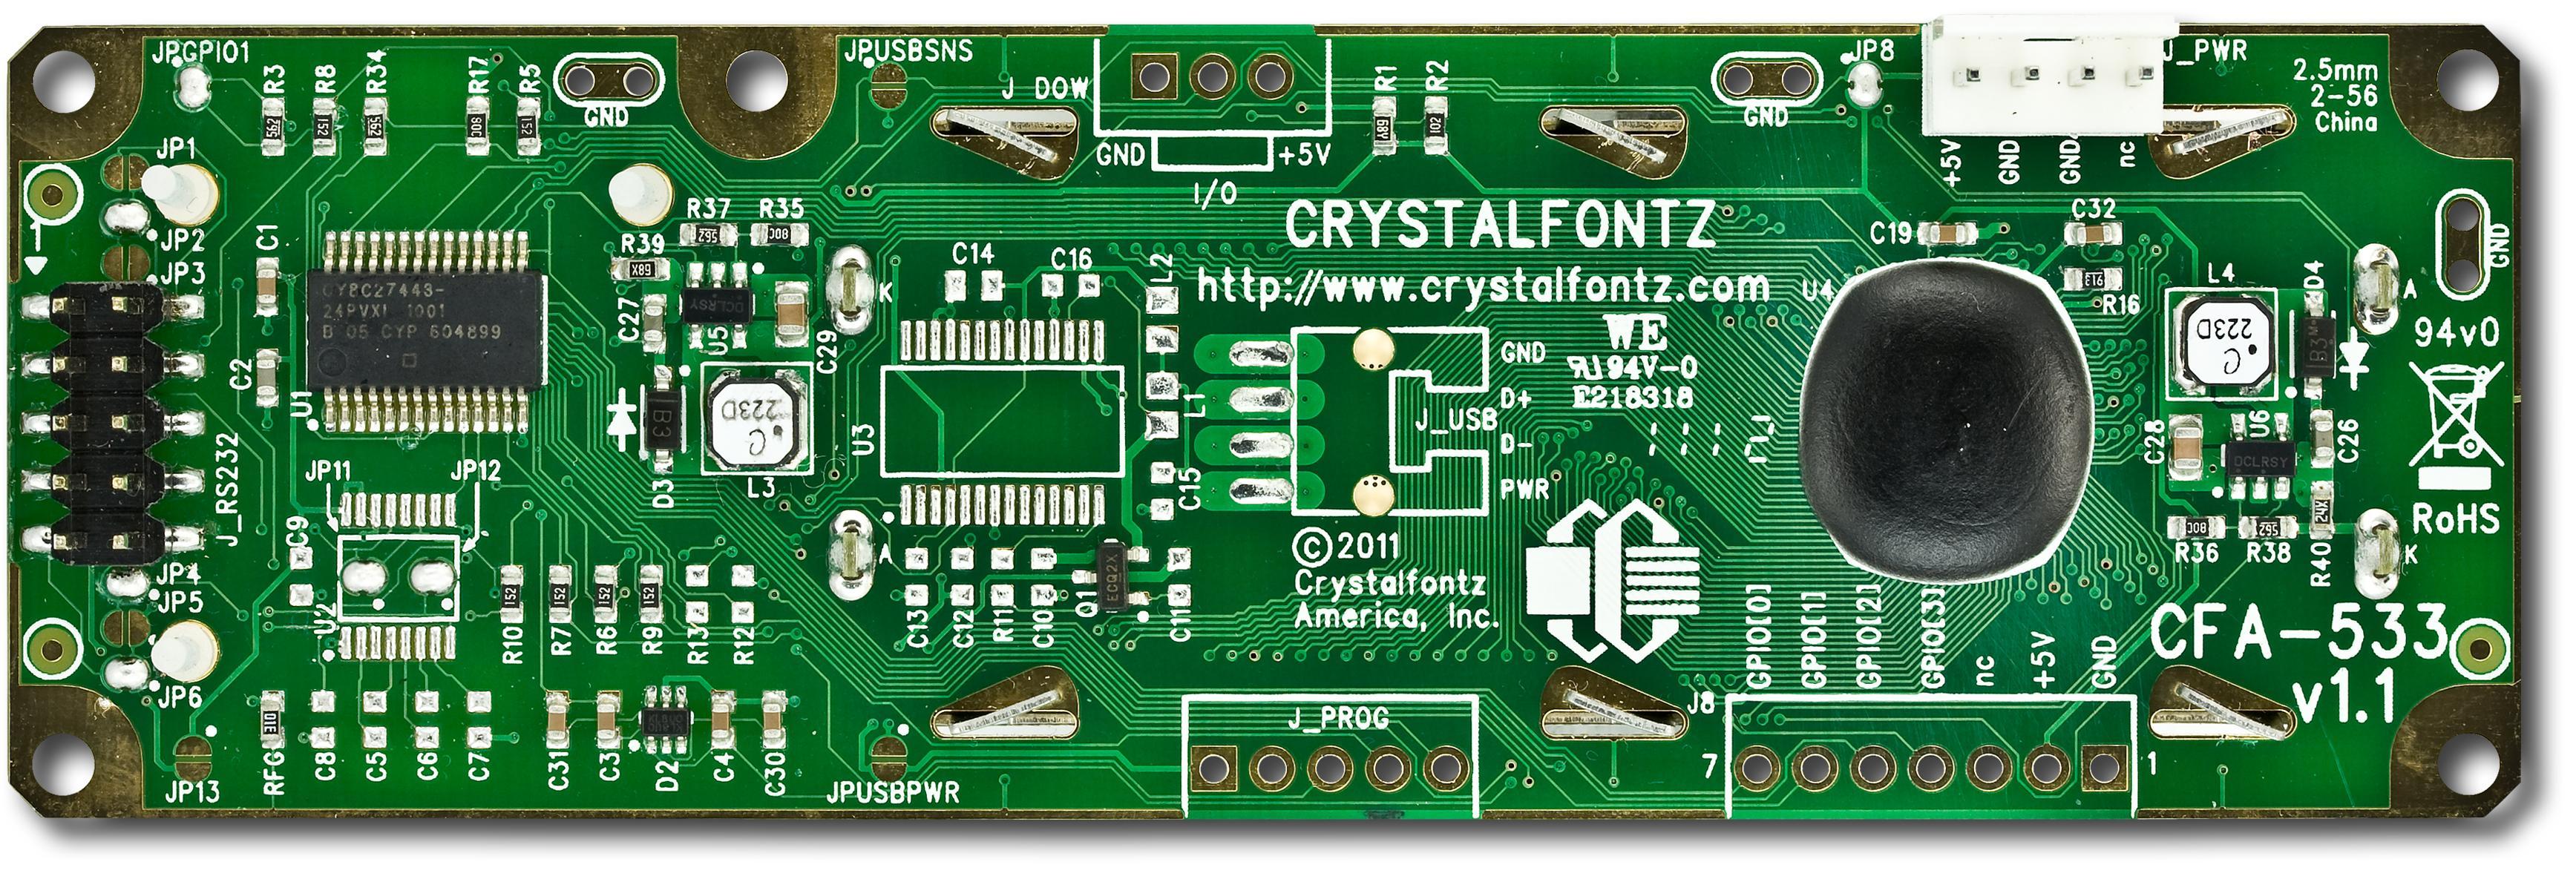 16x2 I2C Character LCD